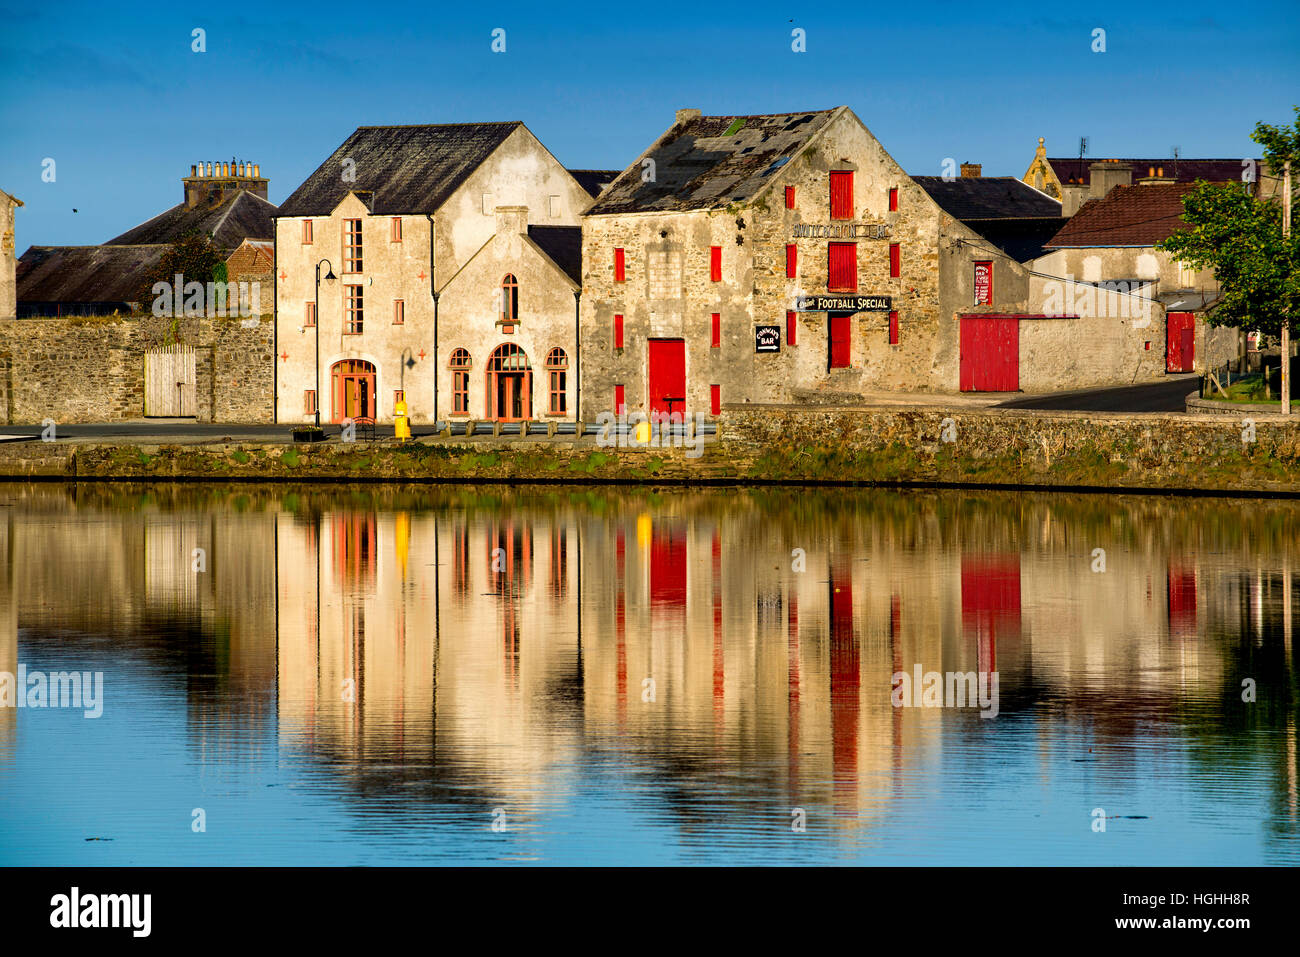 Reflections on River Lennon Rathmelton Ramelton Donegal Ireland - Stock Image